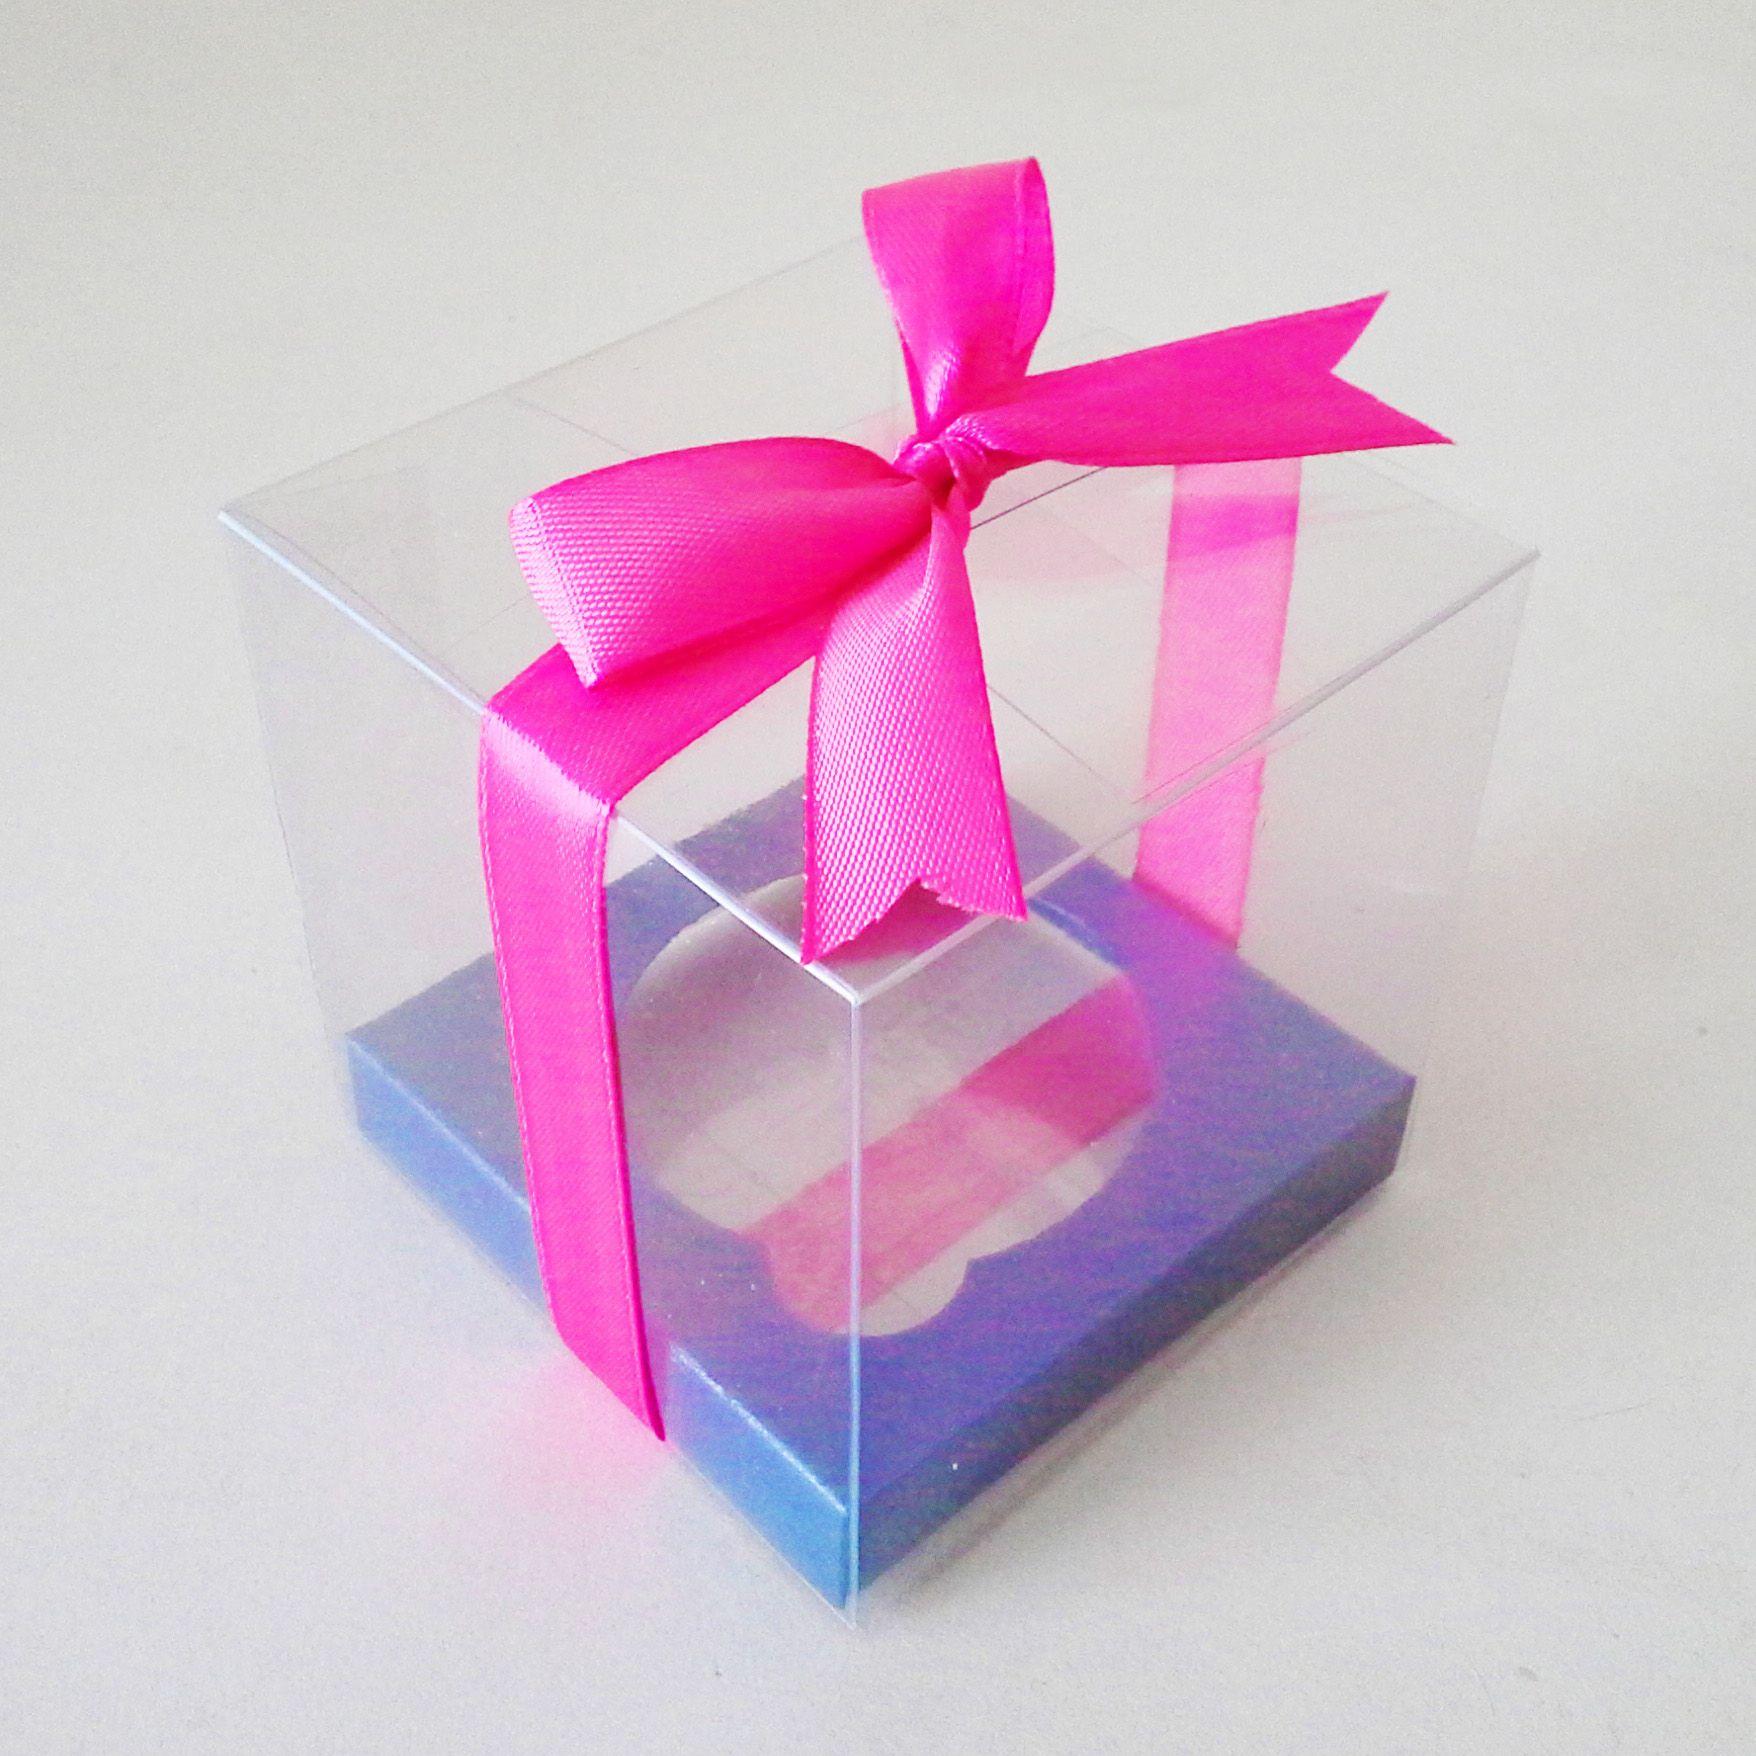 Caja de acetato individual para cupcakes con moño fiusha y base azul ...